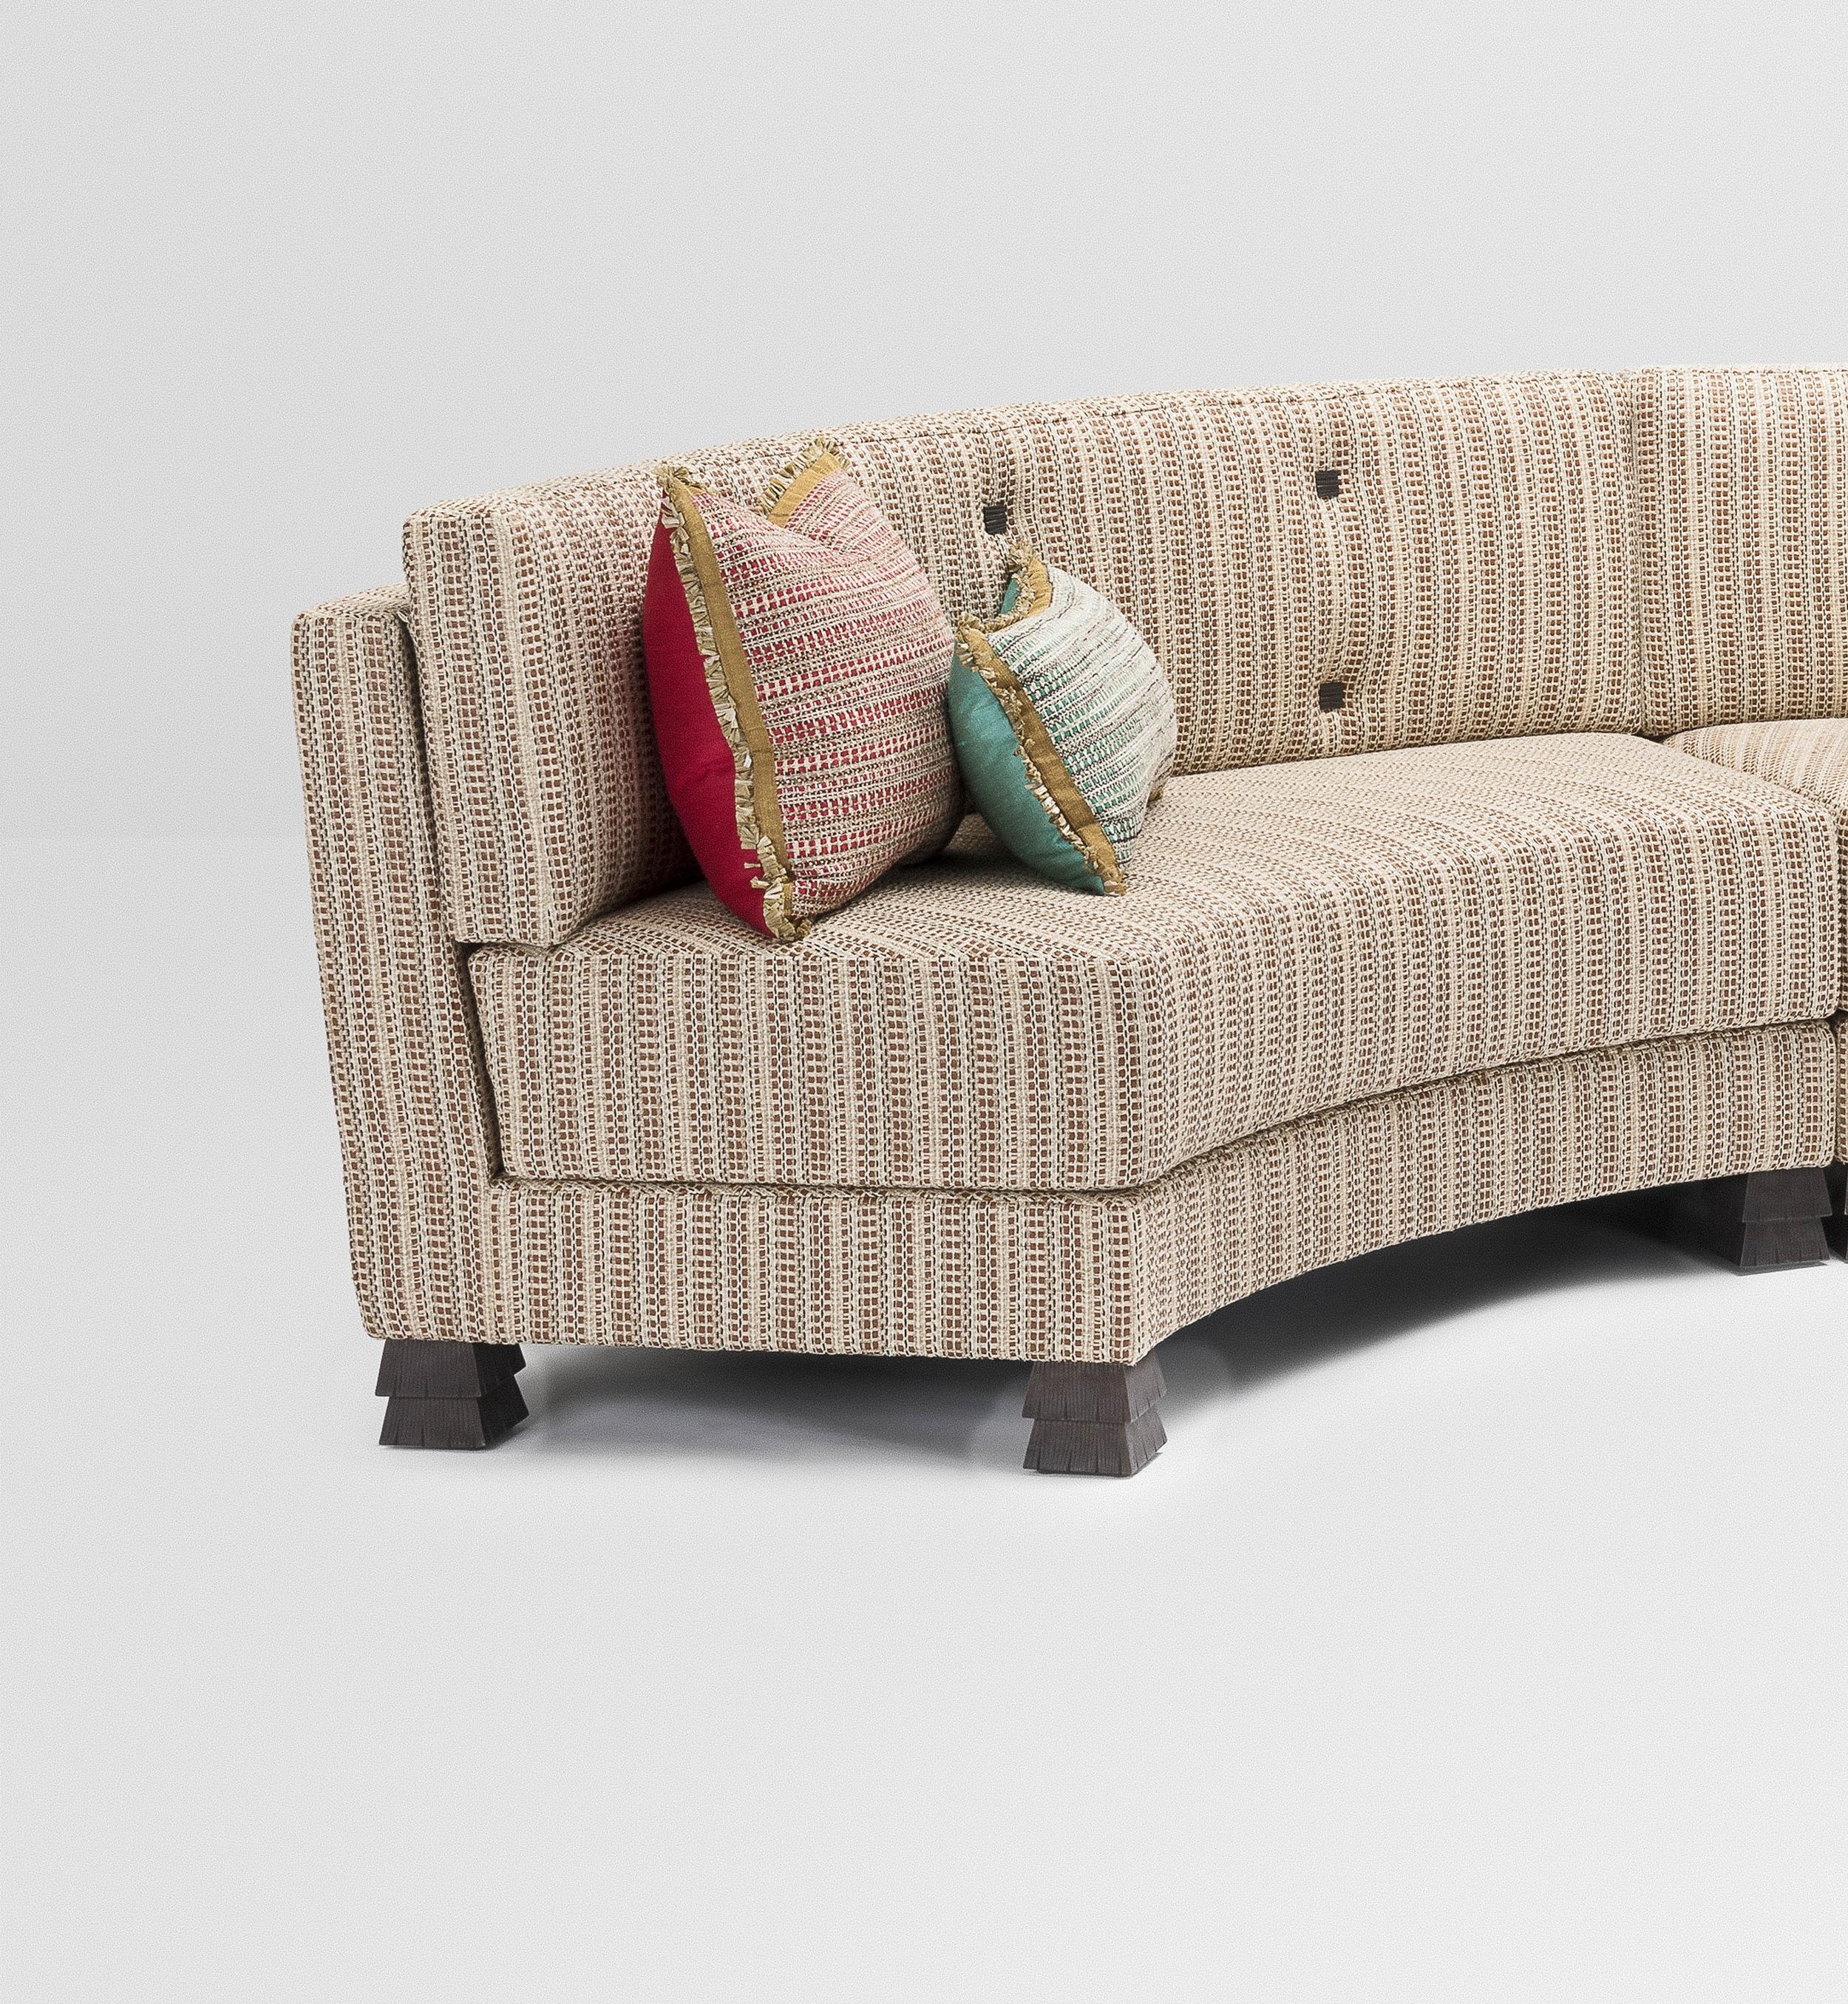 Lulu sofa crop2.jpg